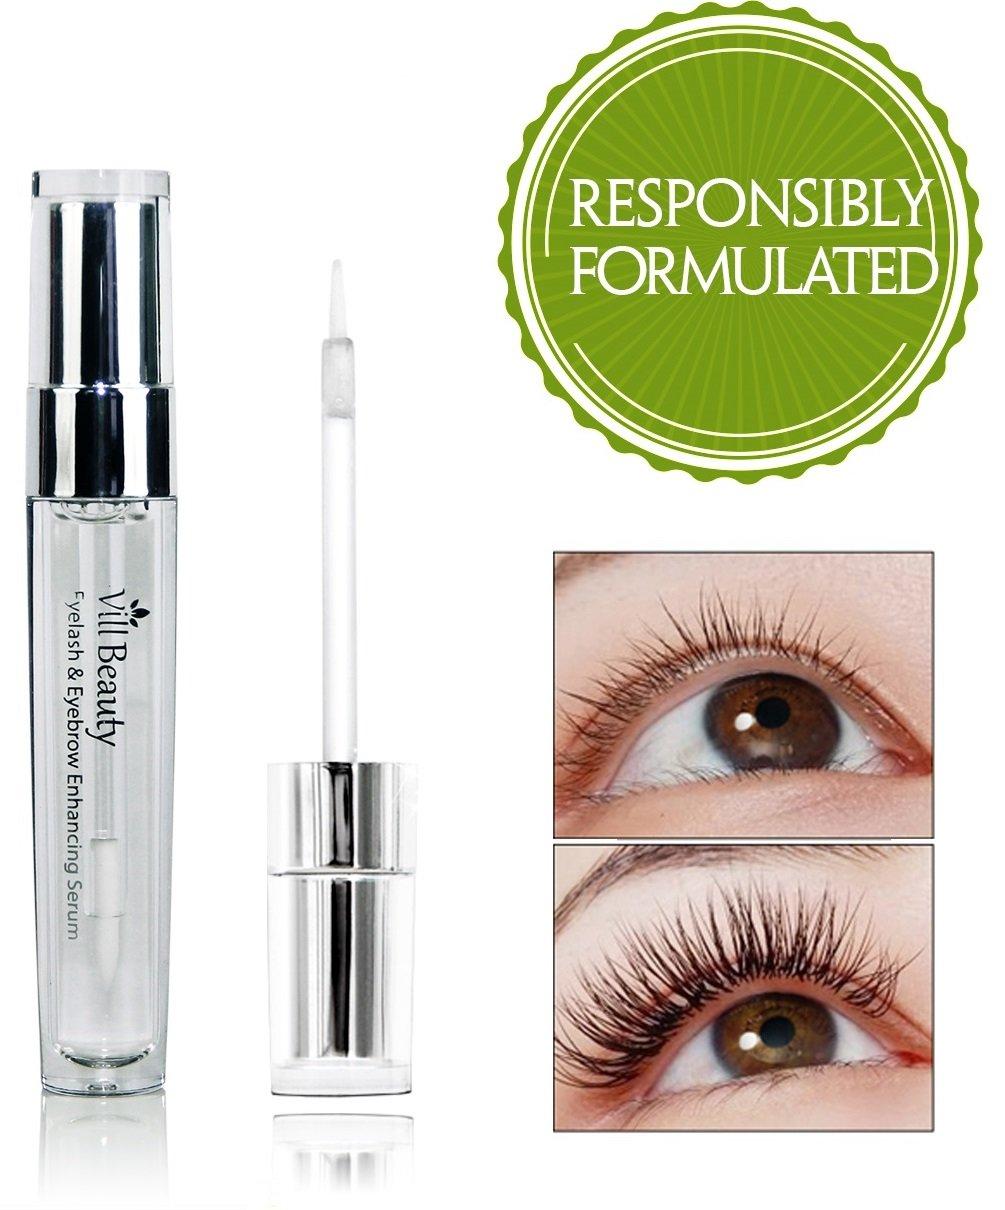 Upgraded Eyelash Growth Serum Enhancer Great For Eyelash Growing